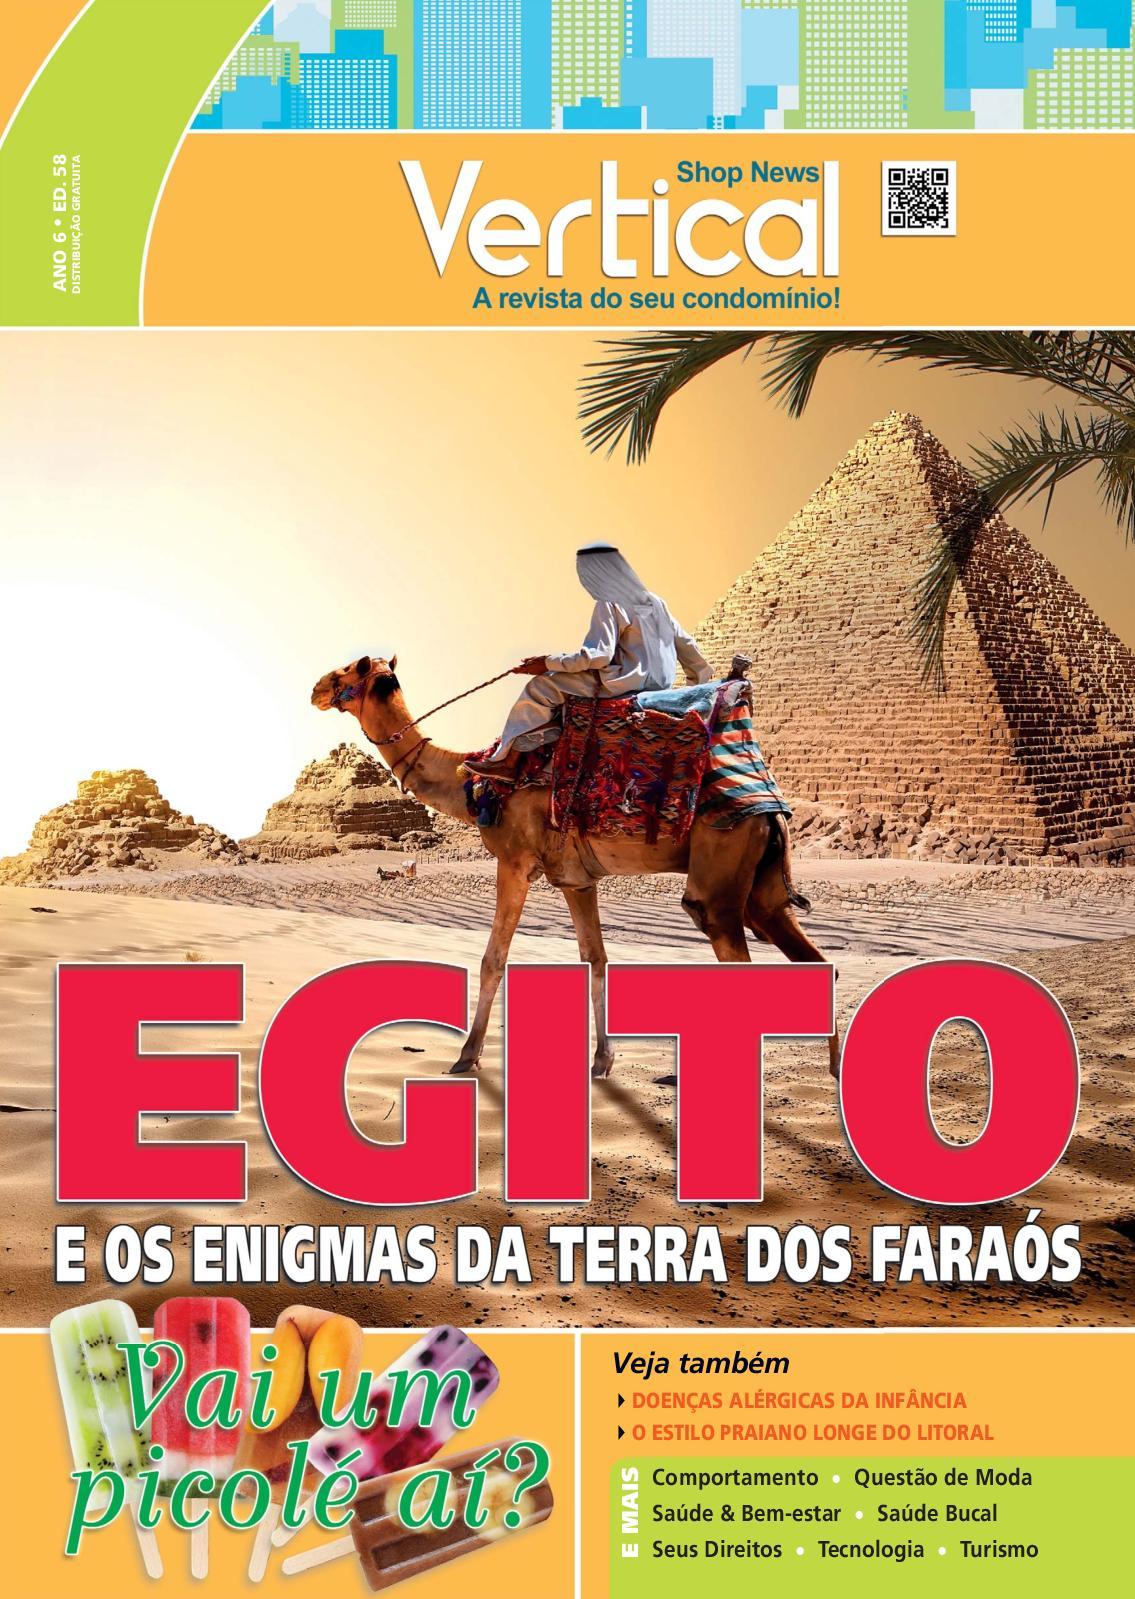 32b2c22a7a0 Calaméo - Revista Vertical Ed 58